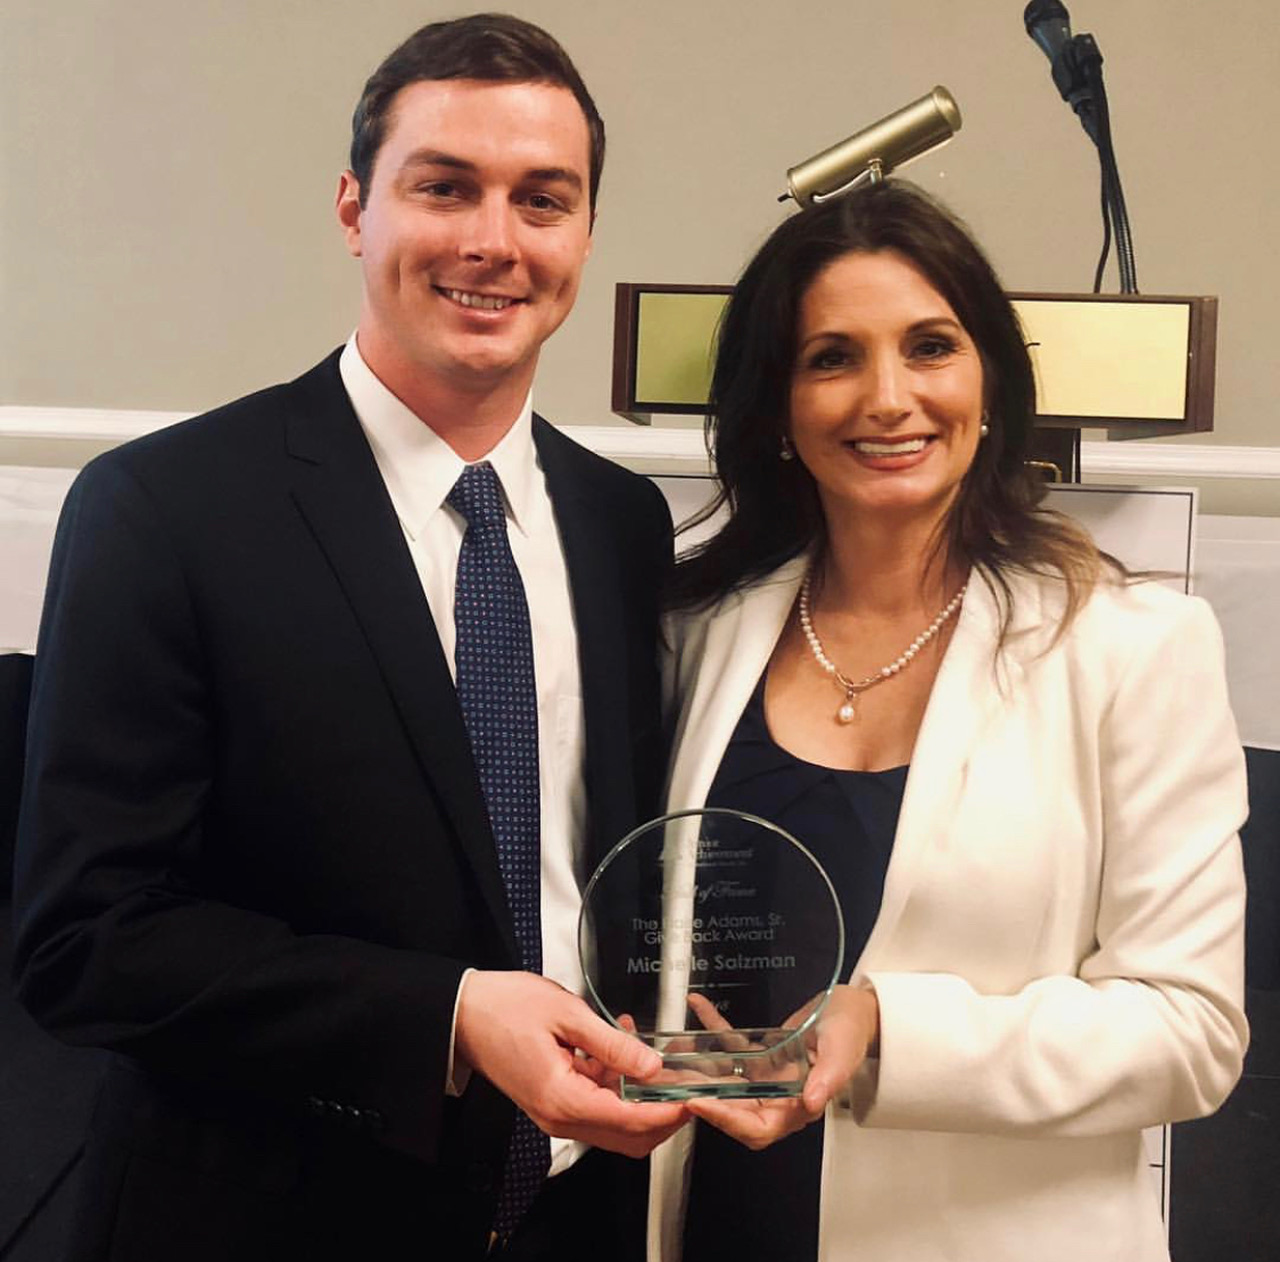 michelle receiving the blaise adams award